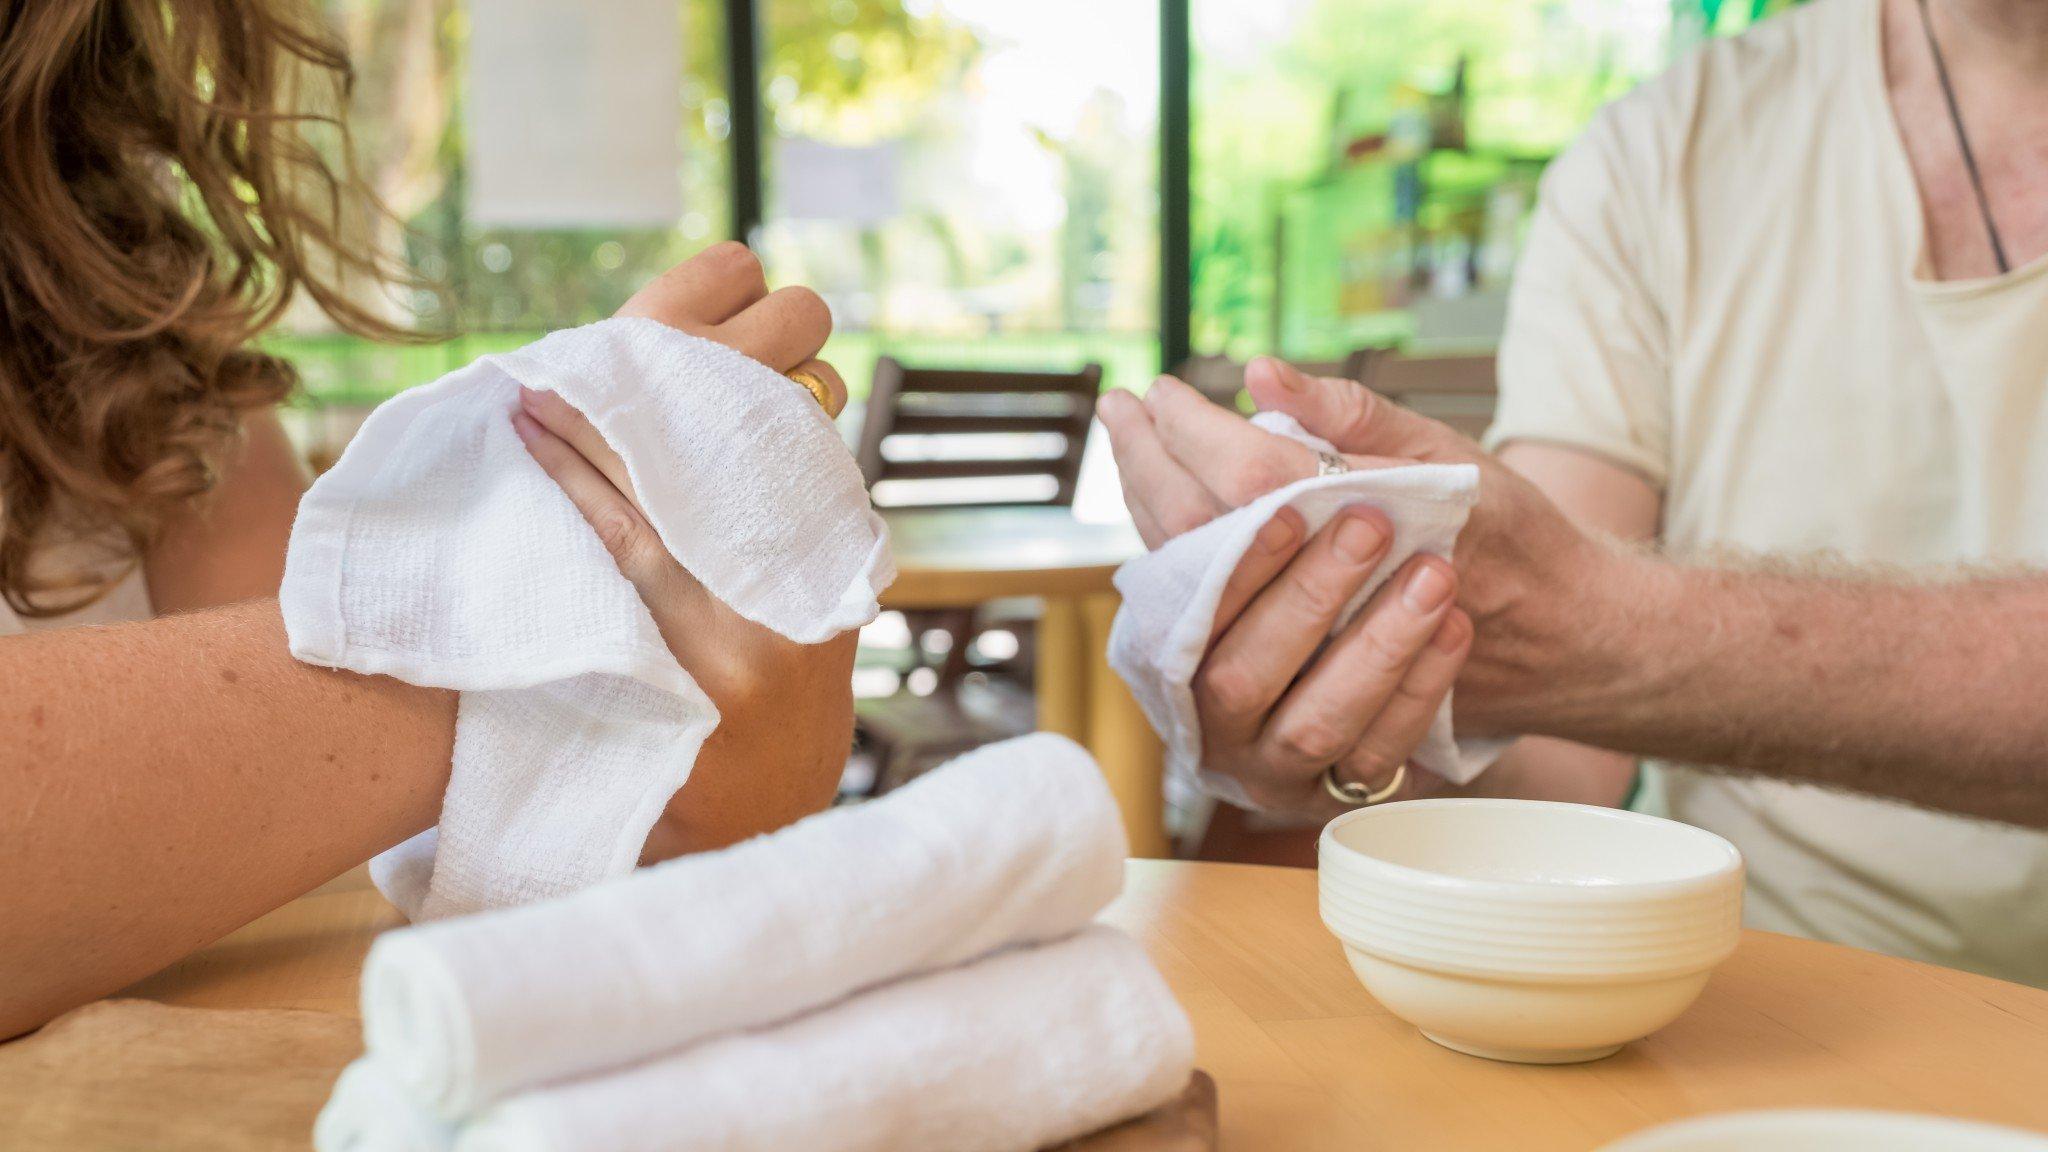 Oshibori Towels - Take a Moment to Connect